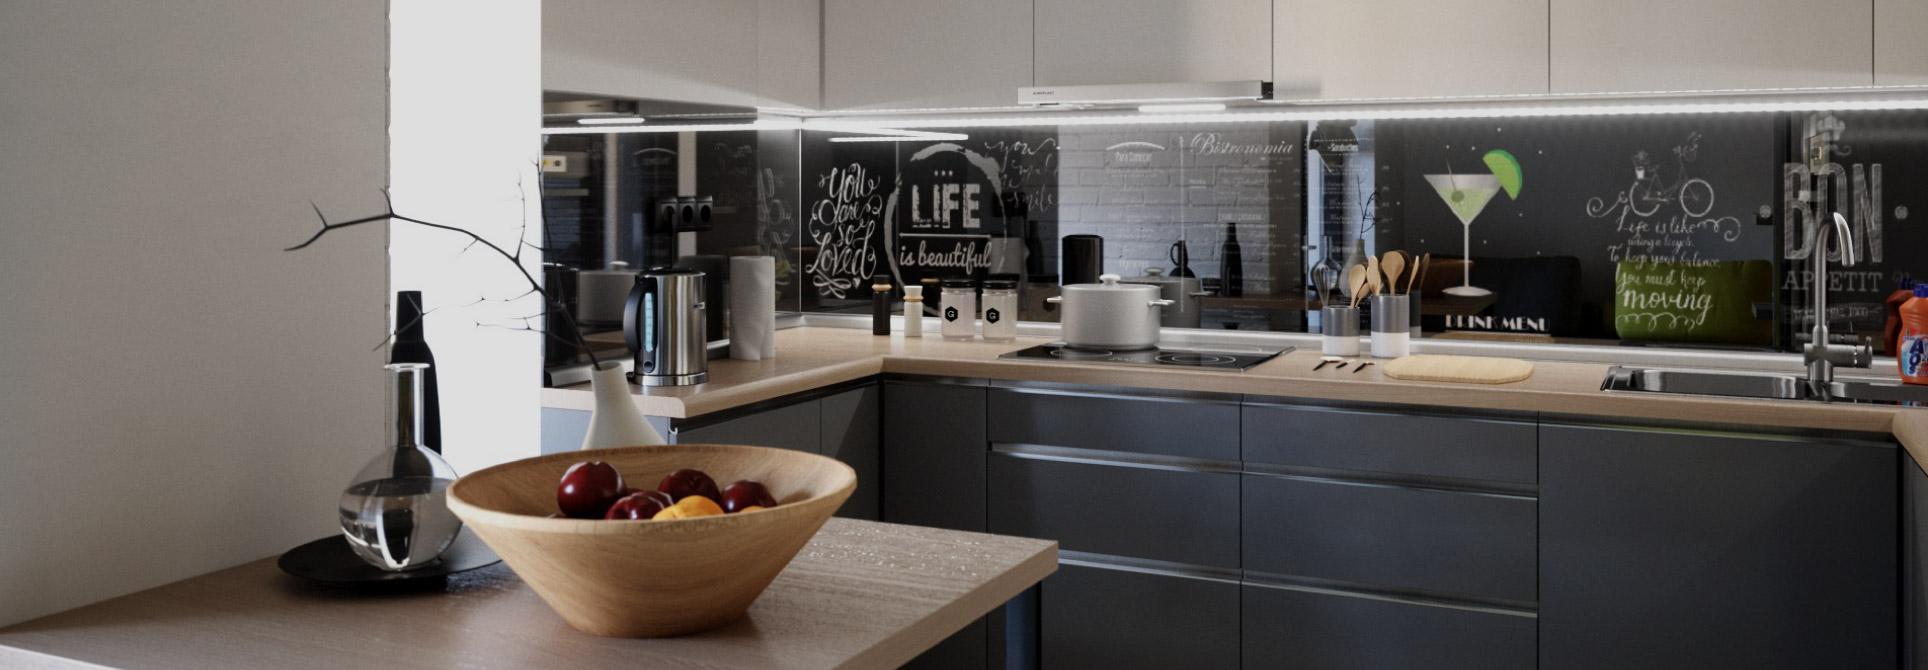 viata e frumoasa bucatarie moderna manere aluminiu